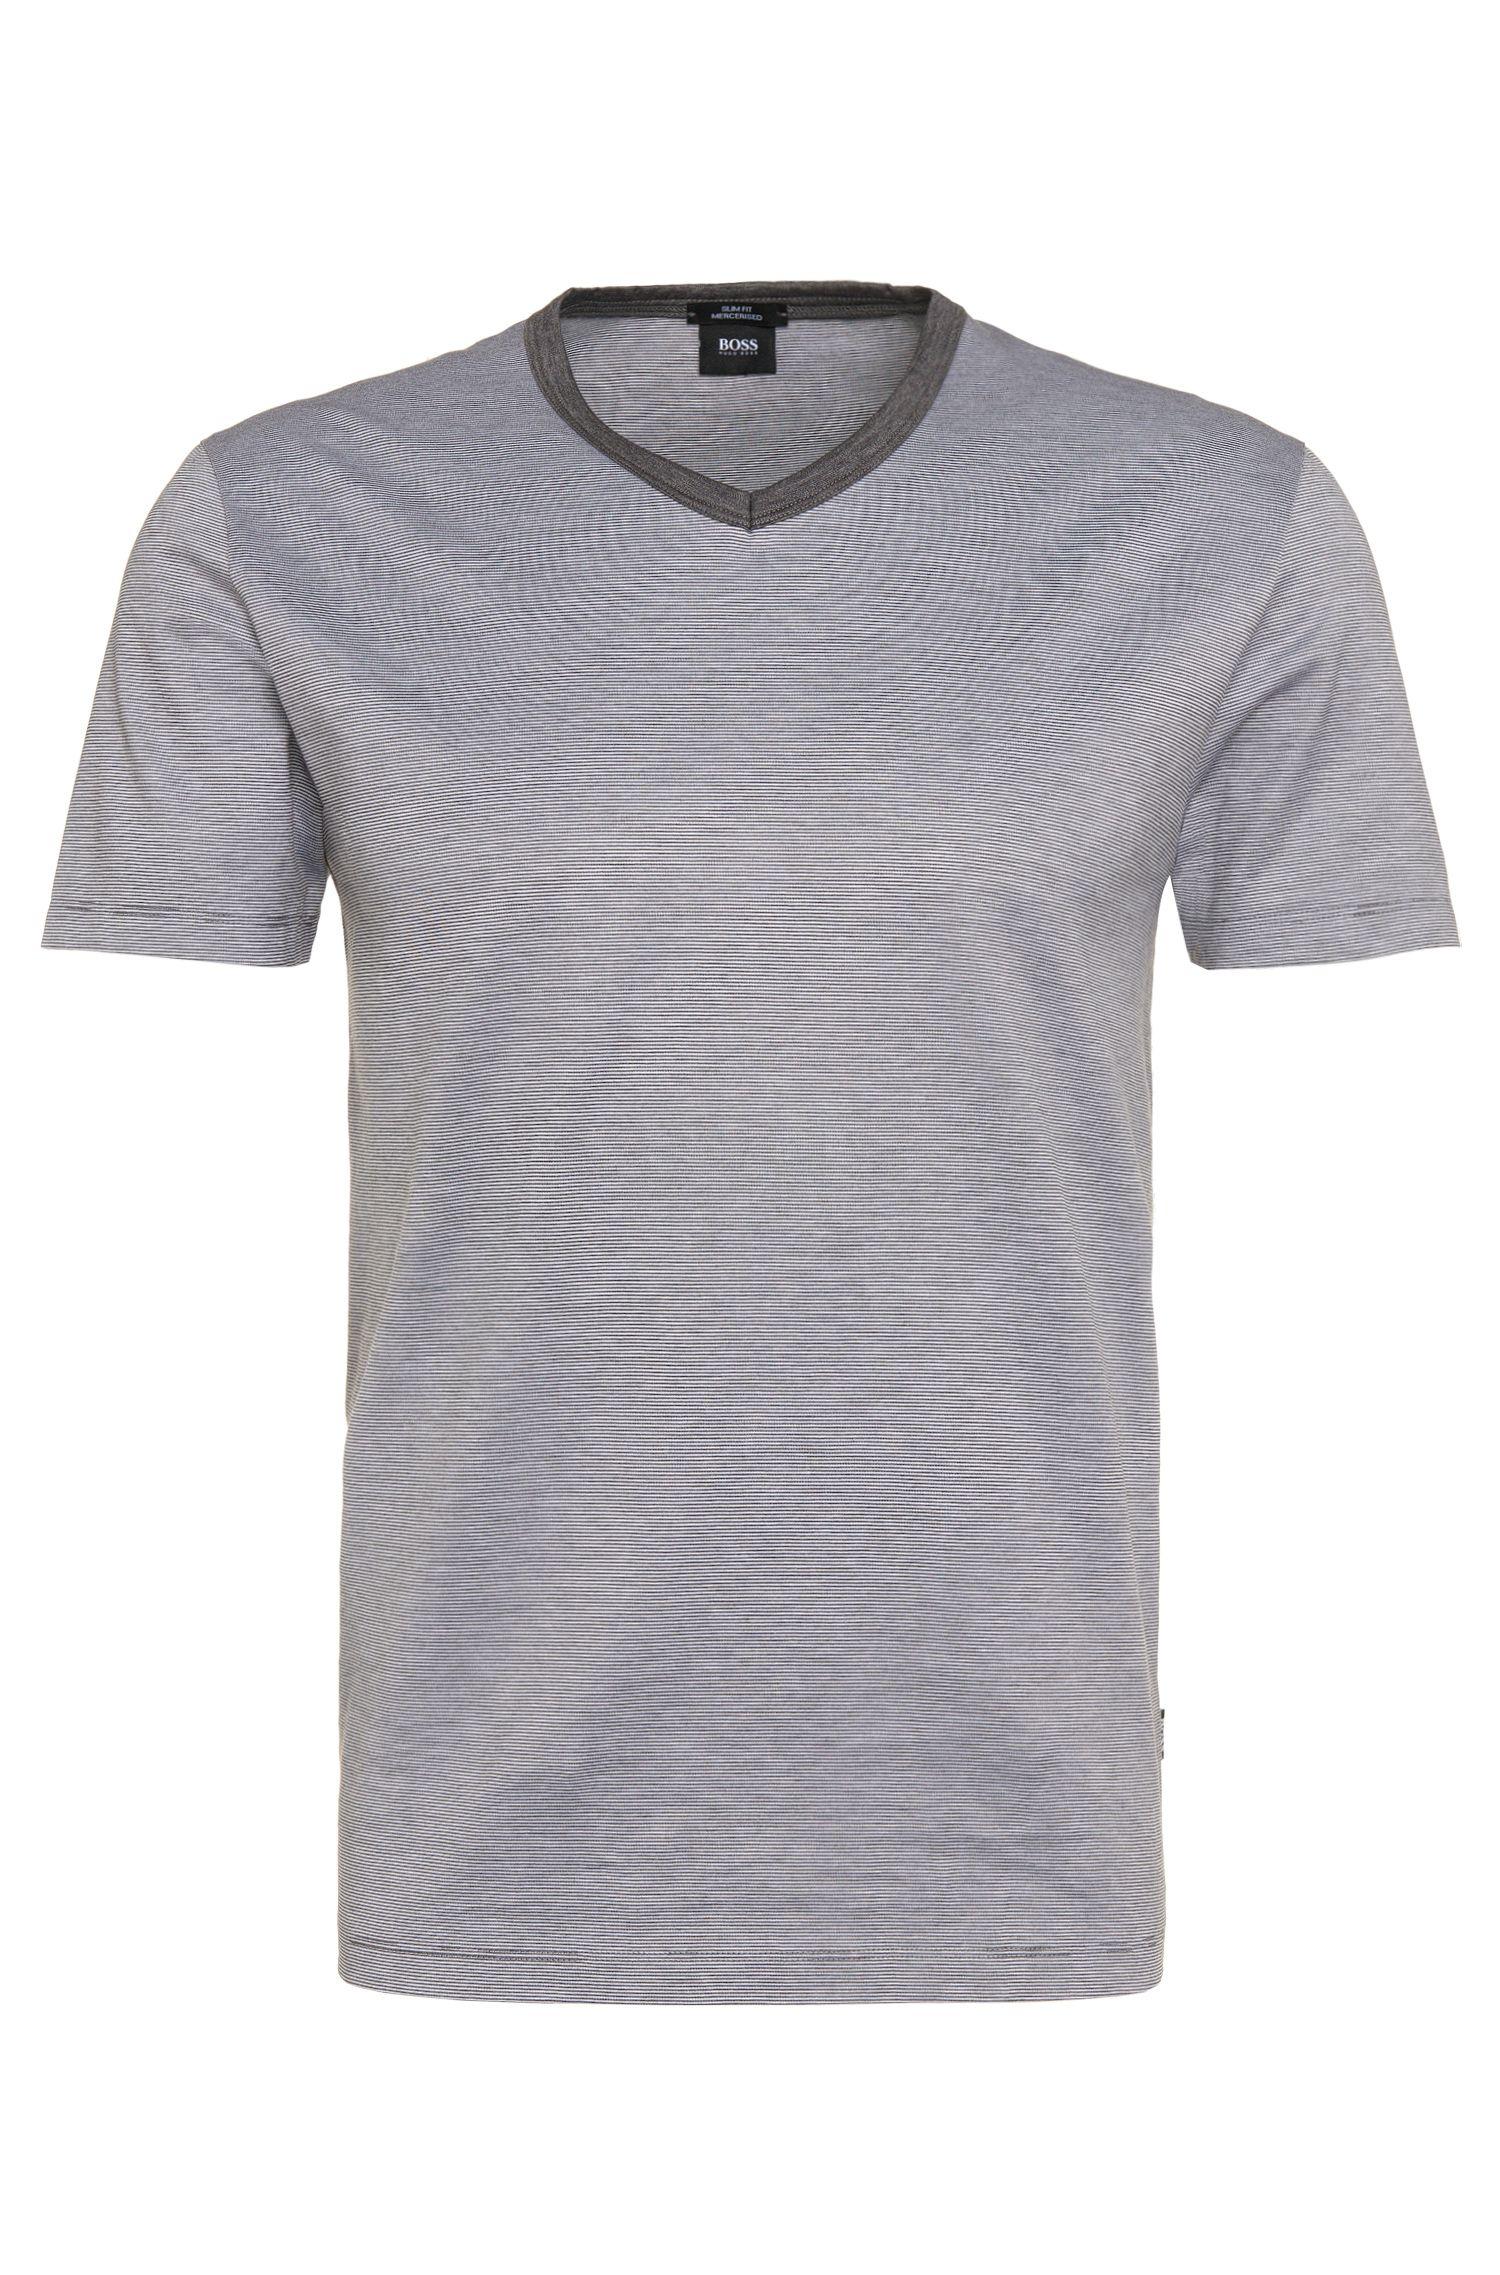 'Teal 08' | Cotton Striped T-Shirt